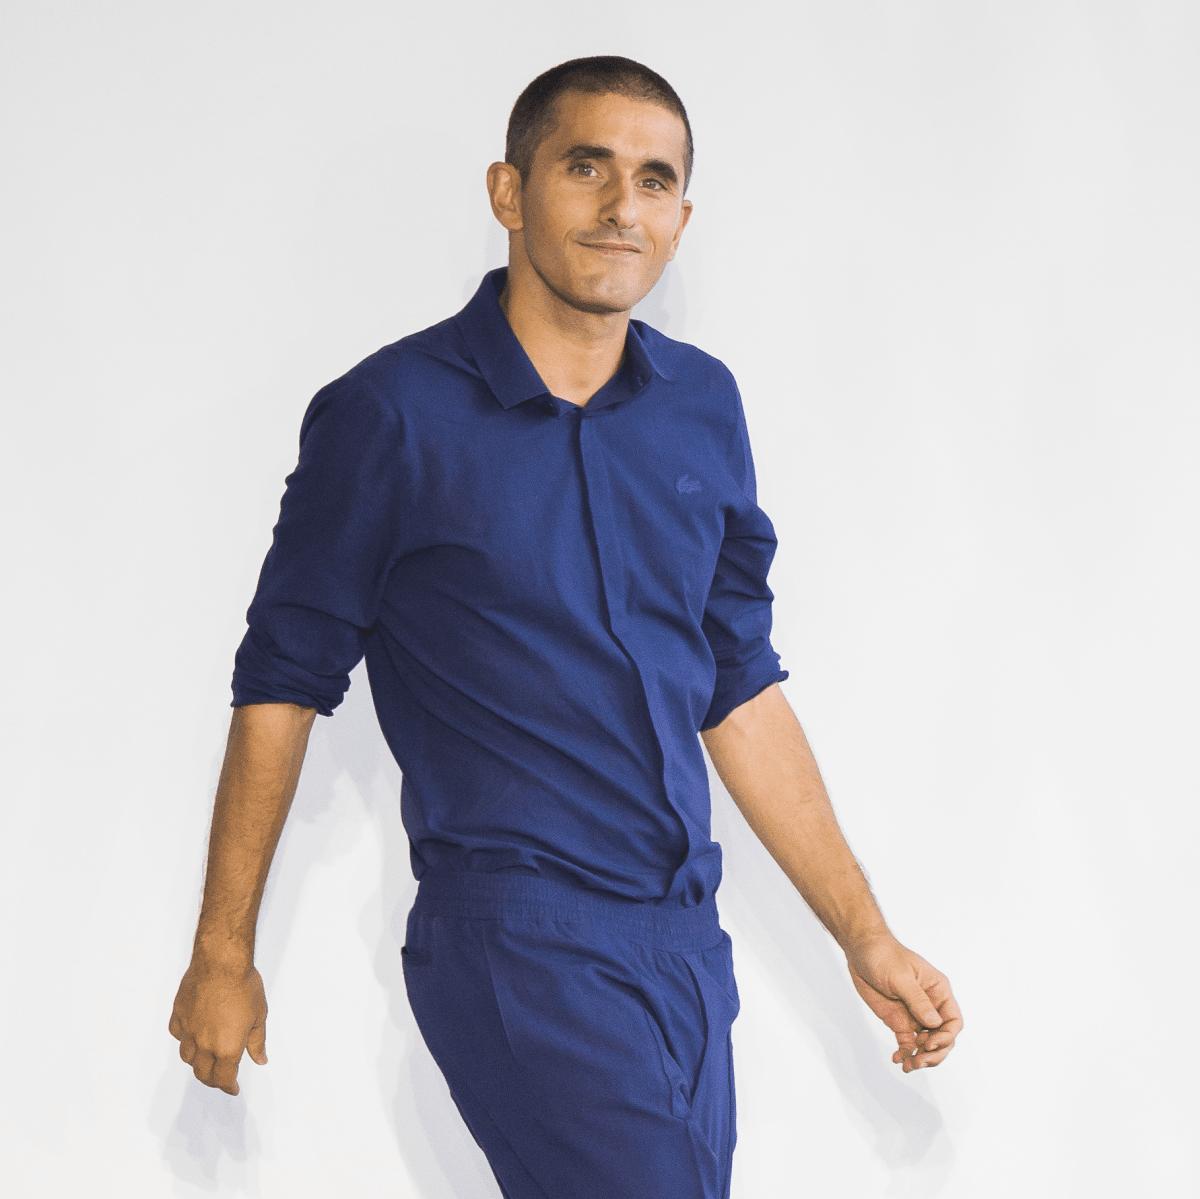 Lacoste creative director Felipe Oliveira Baptista,